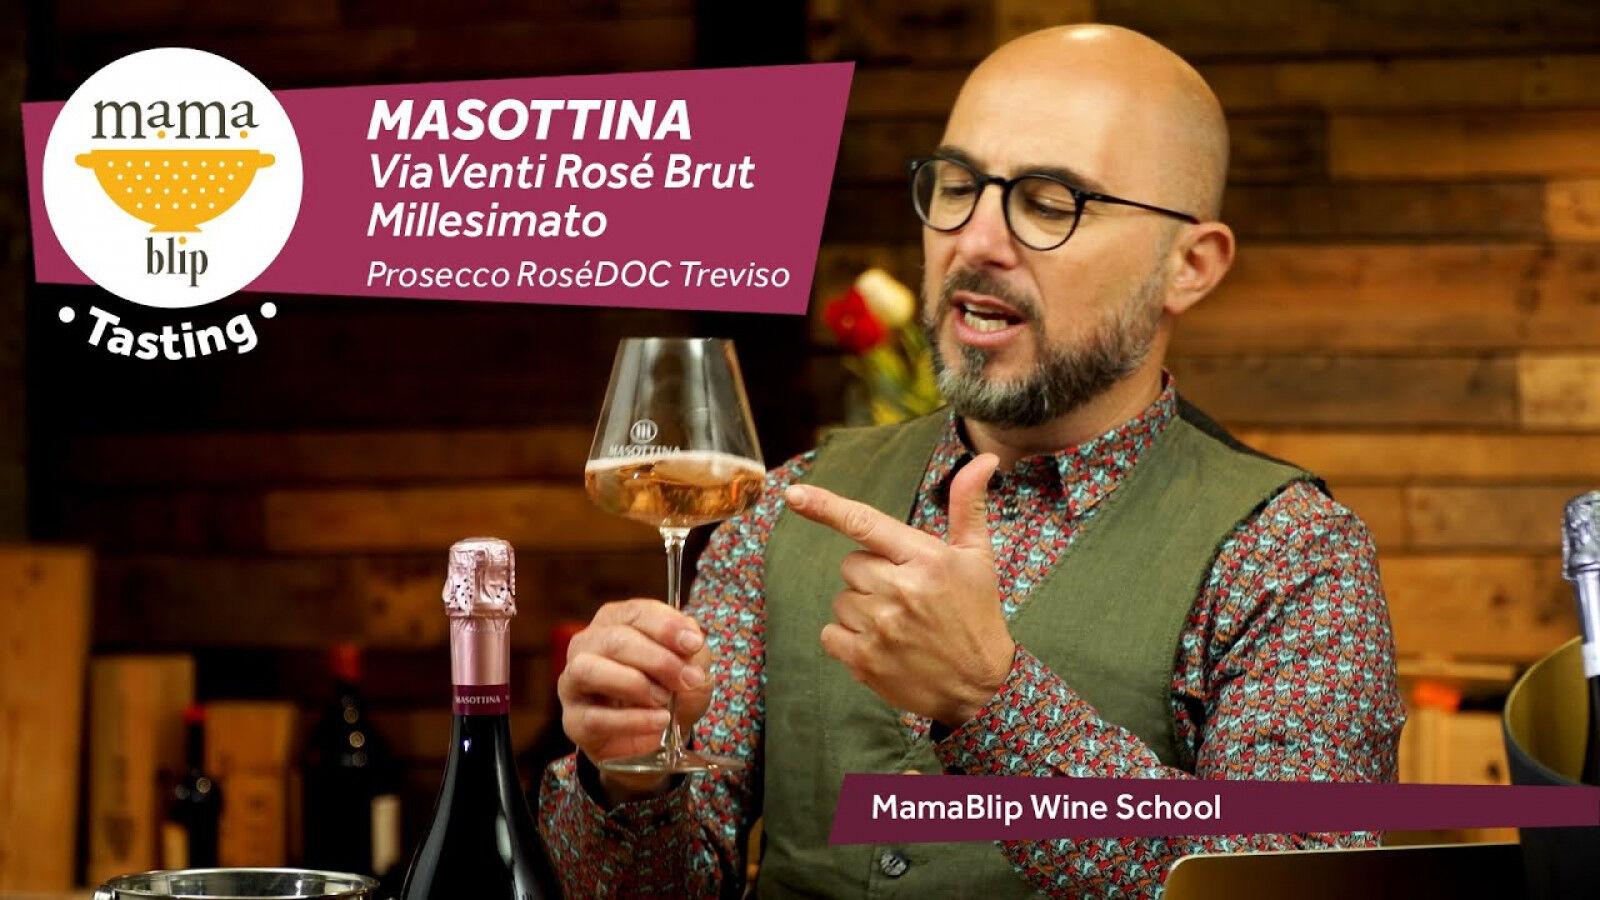 tagAlt.masottina extra brut rose